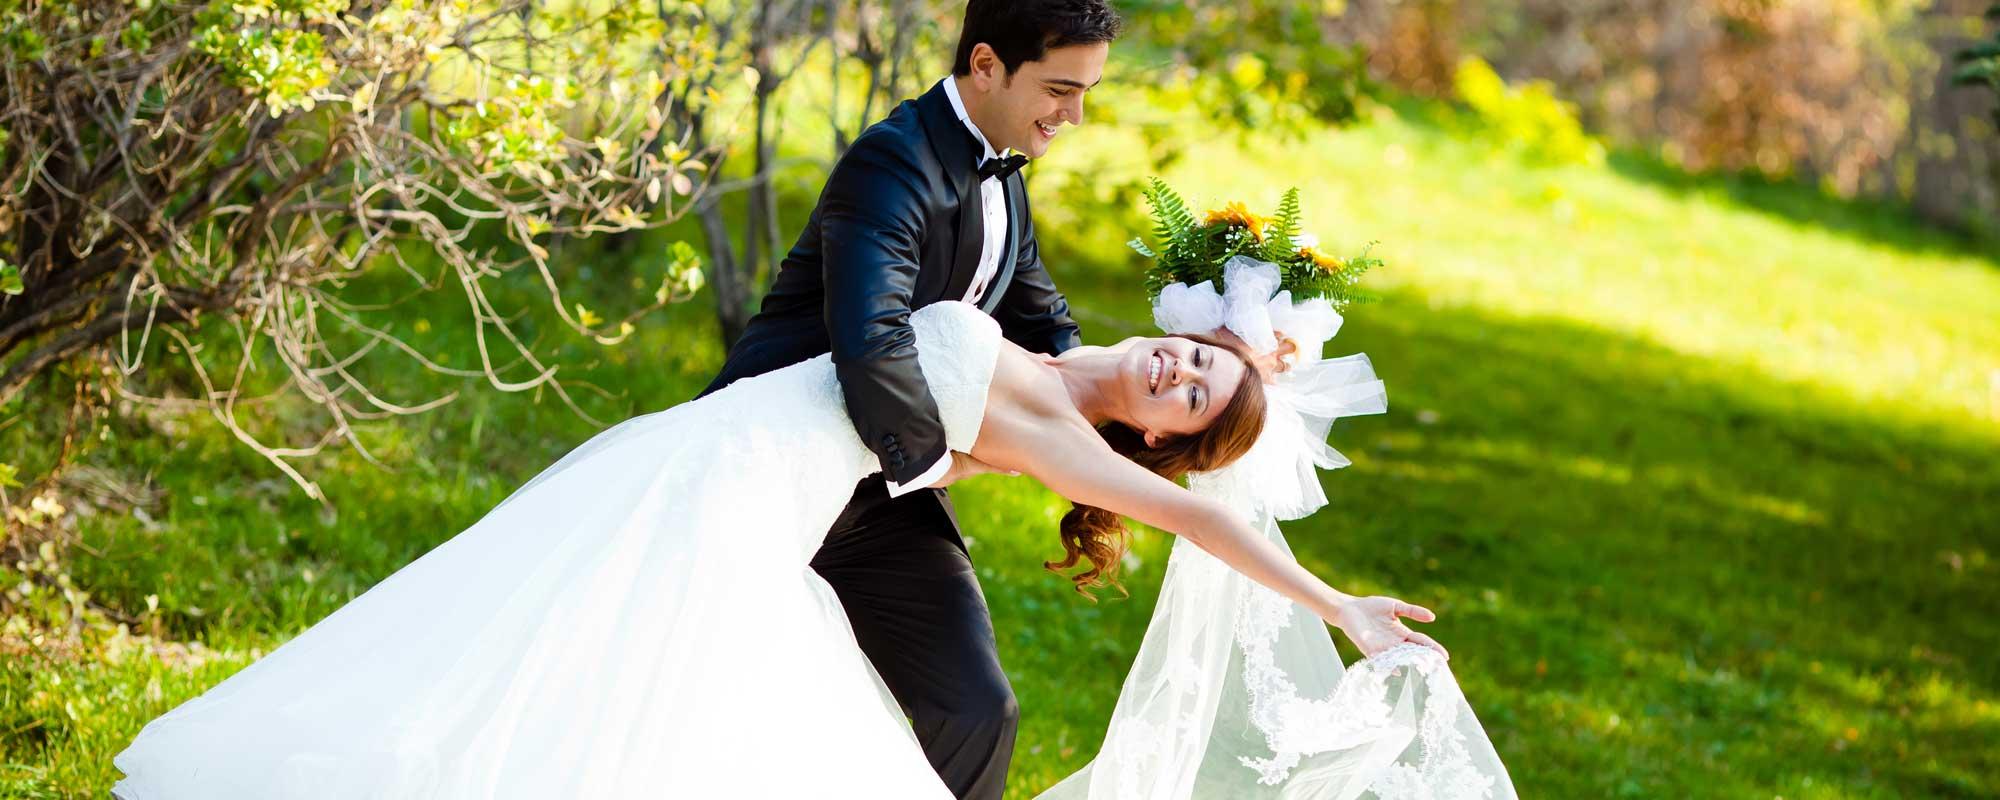 Celebrando Matrimonio